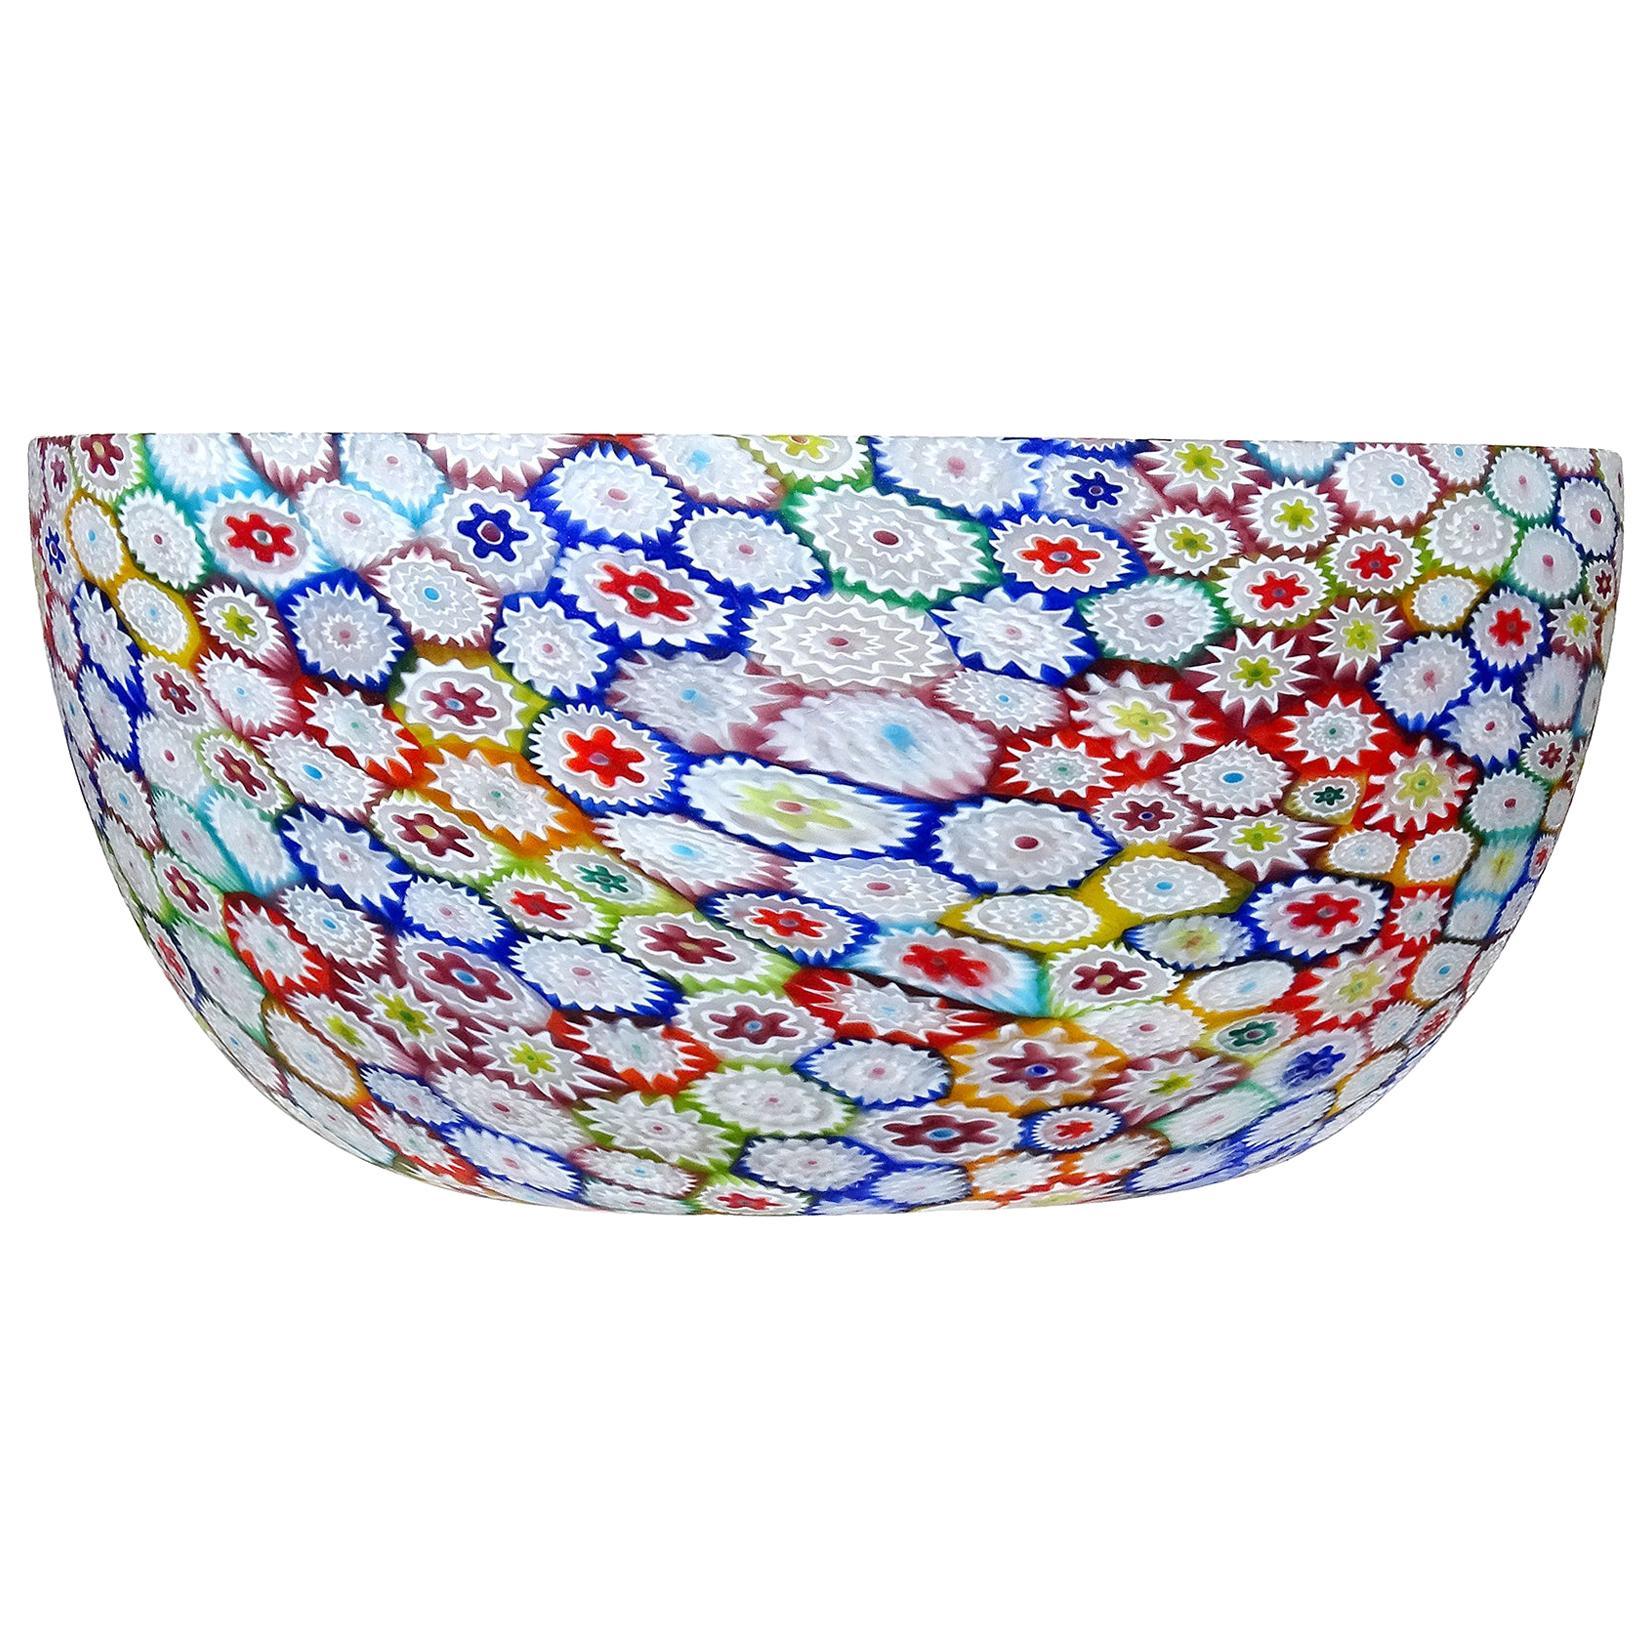 Fratelli Toso Murano Millefiori Flower Mosaic Italian Art Glass Tall Bowl Vase